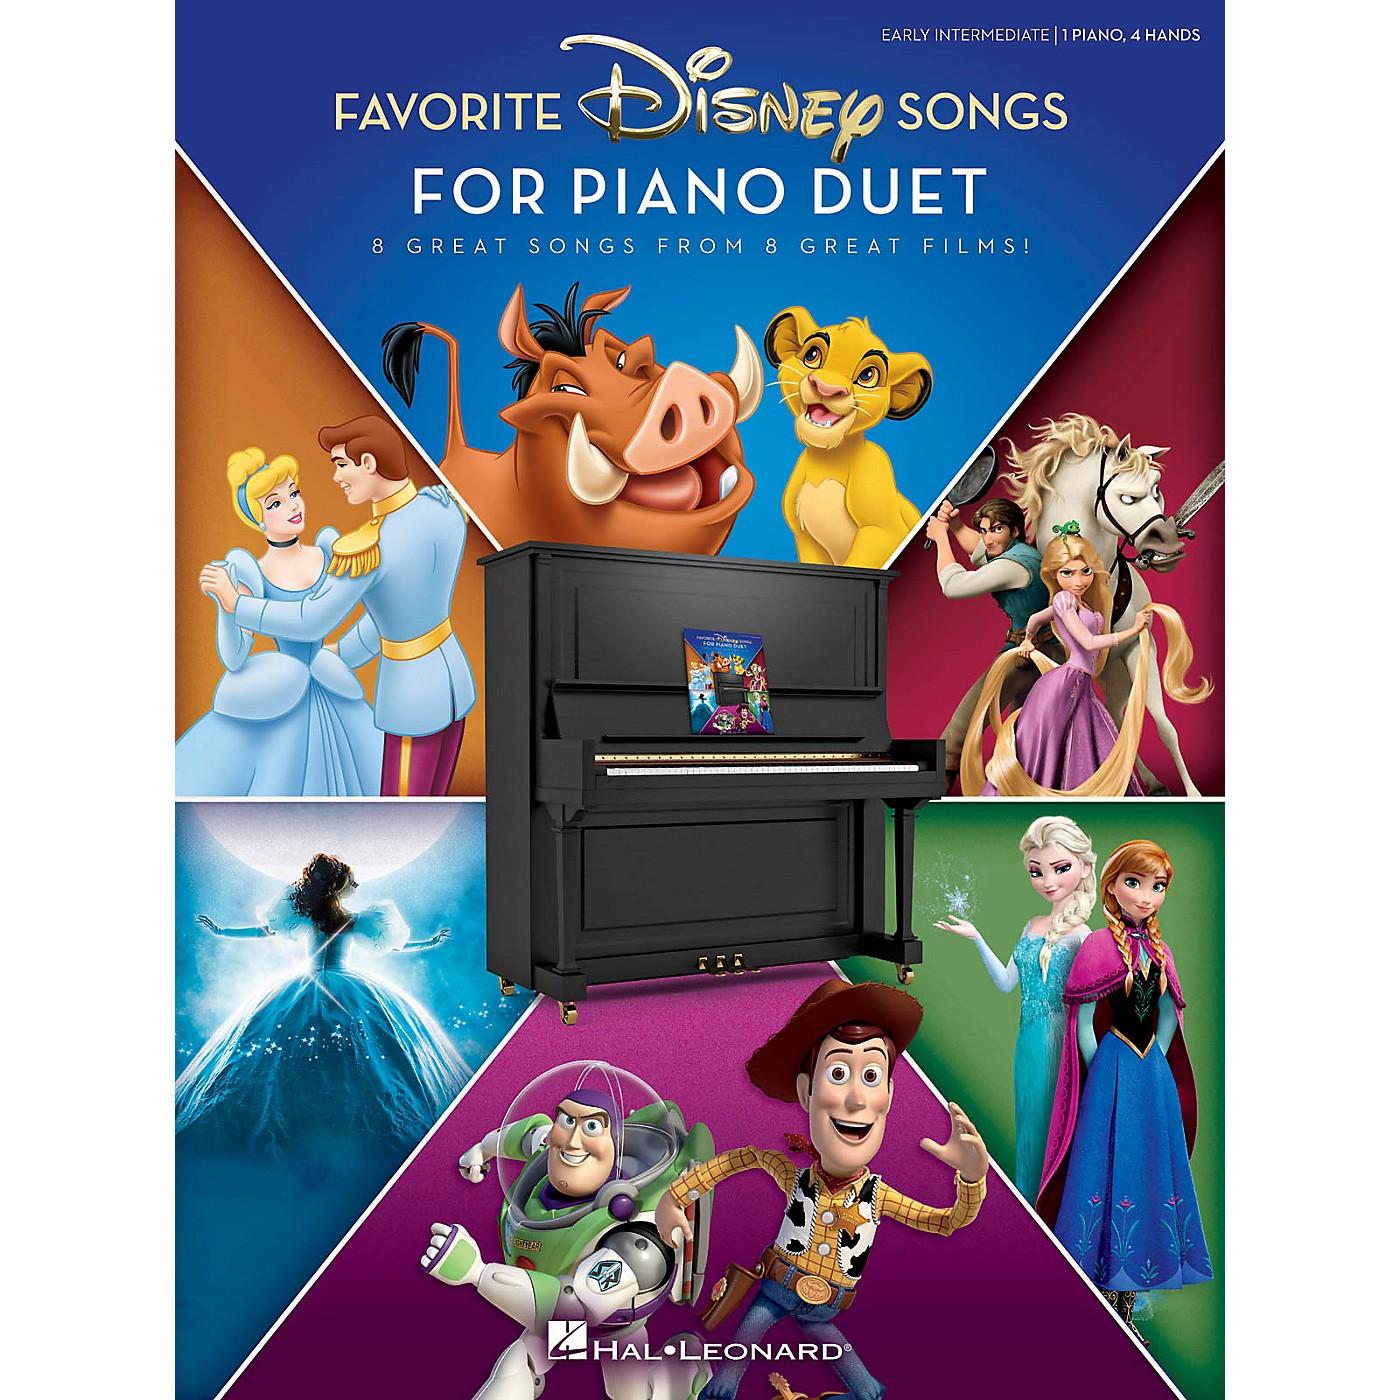 Hal Leonard Favorite Disney Songs for Piano Duet 1 Piano, 4 Hands / Early Intermediate thumbnail